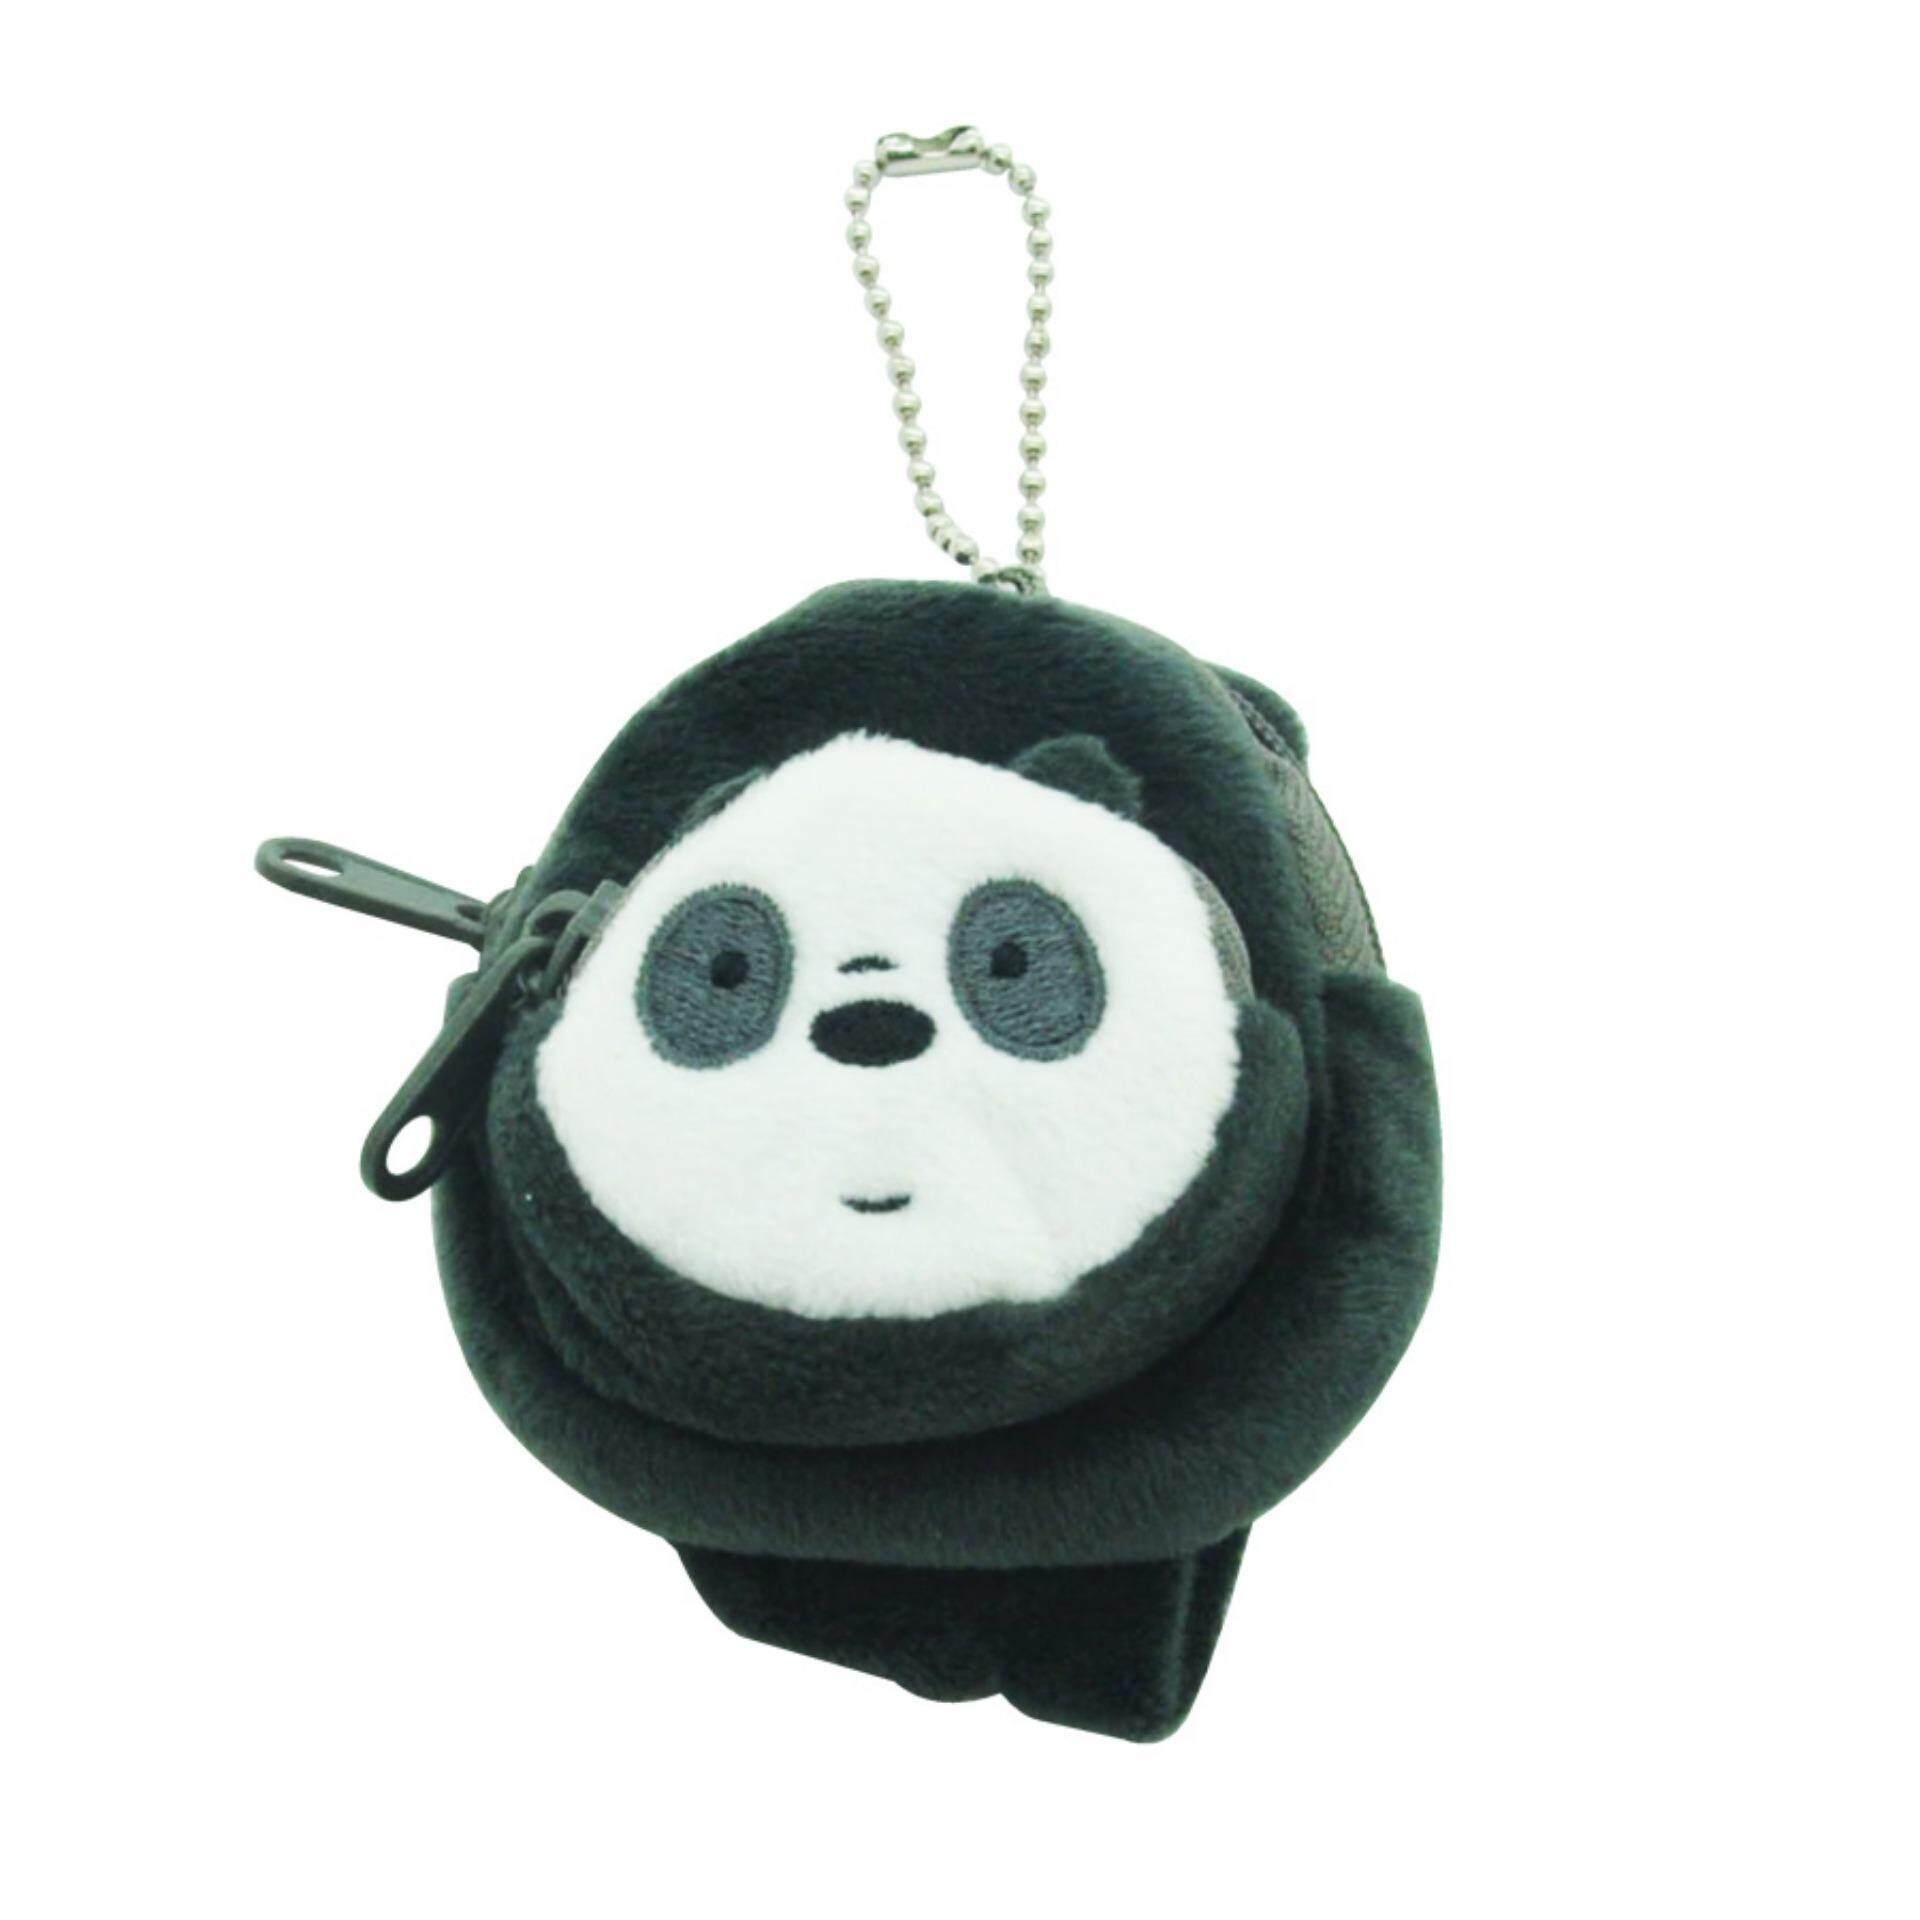 We Bare Bears Mini Backpack Keyring - Panda